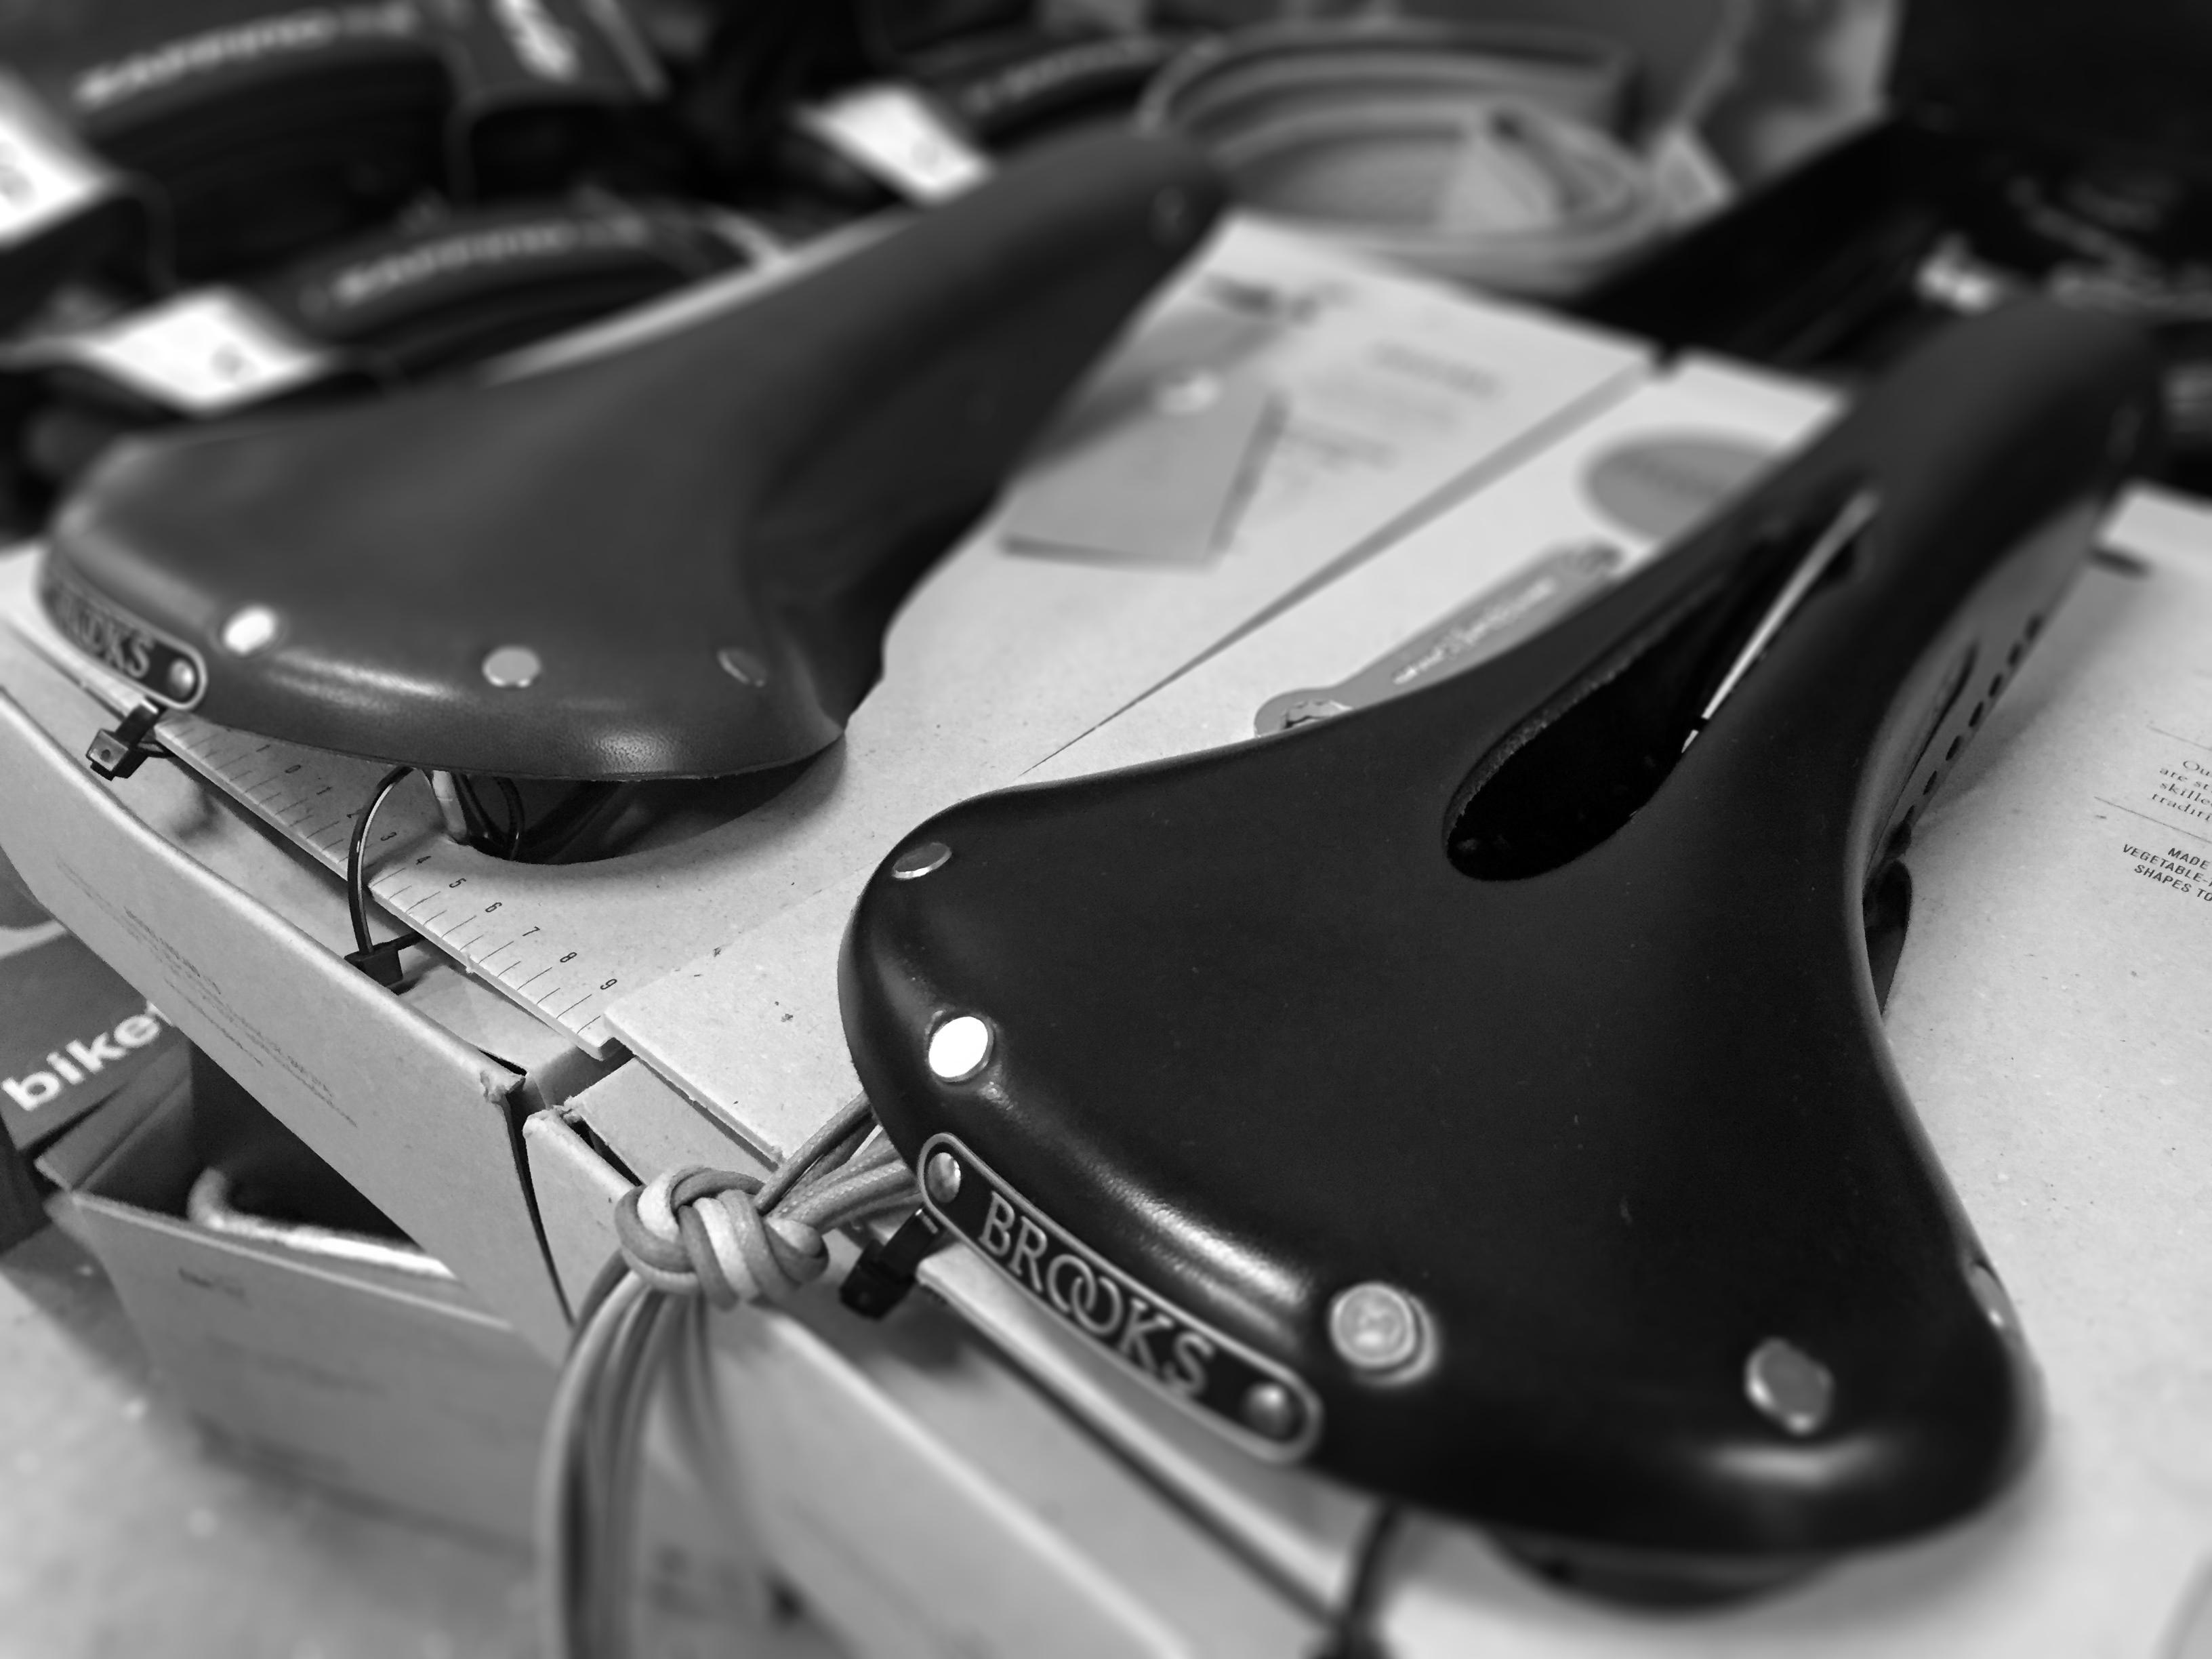 saddles b&w